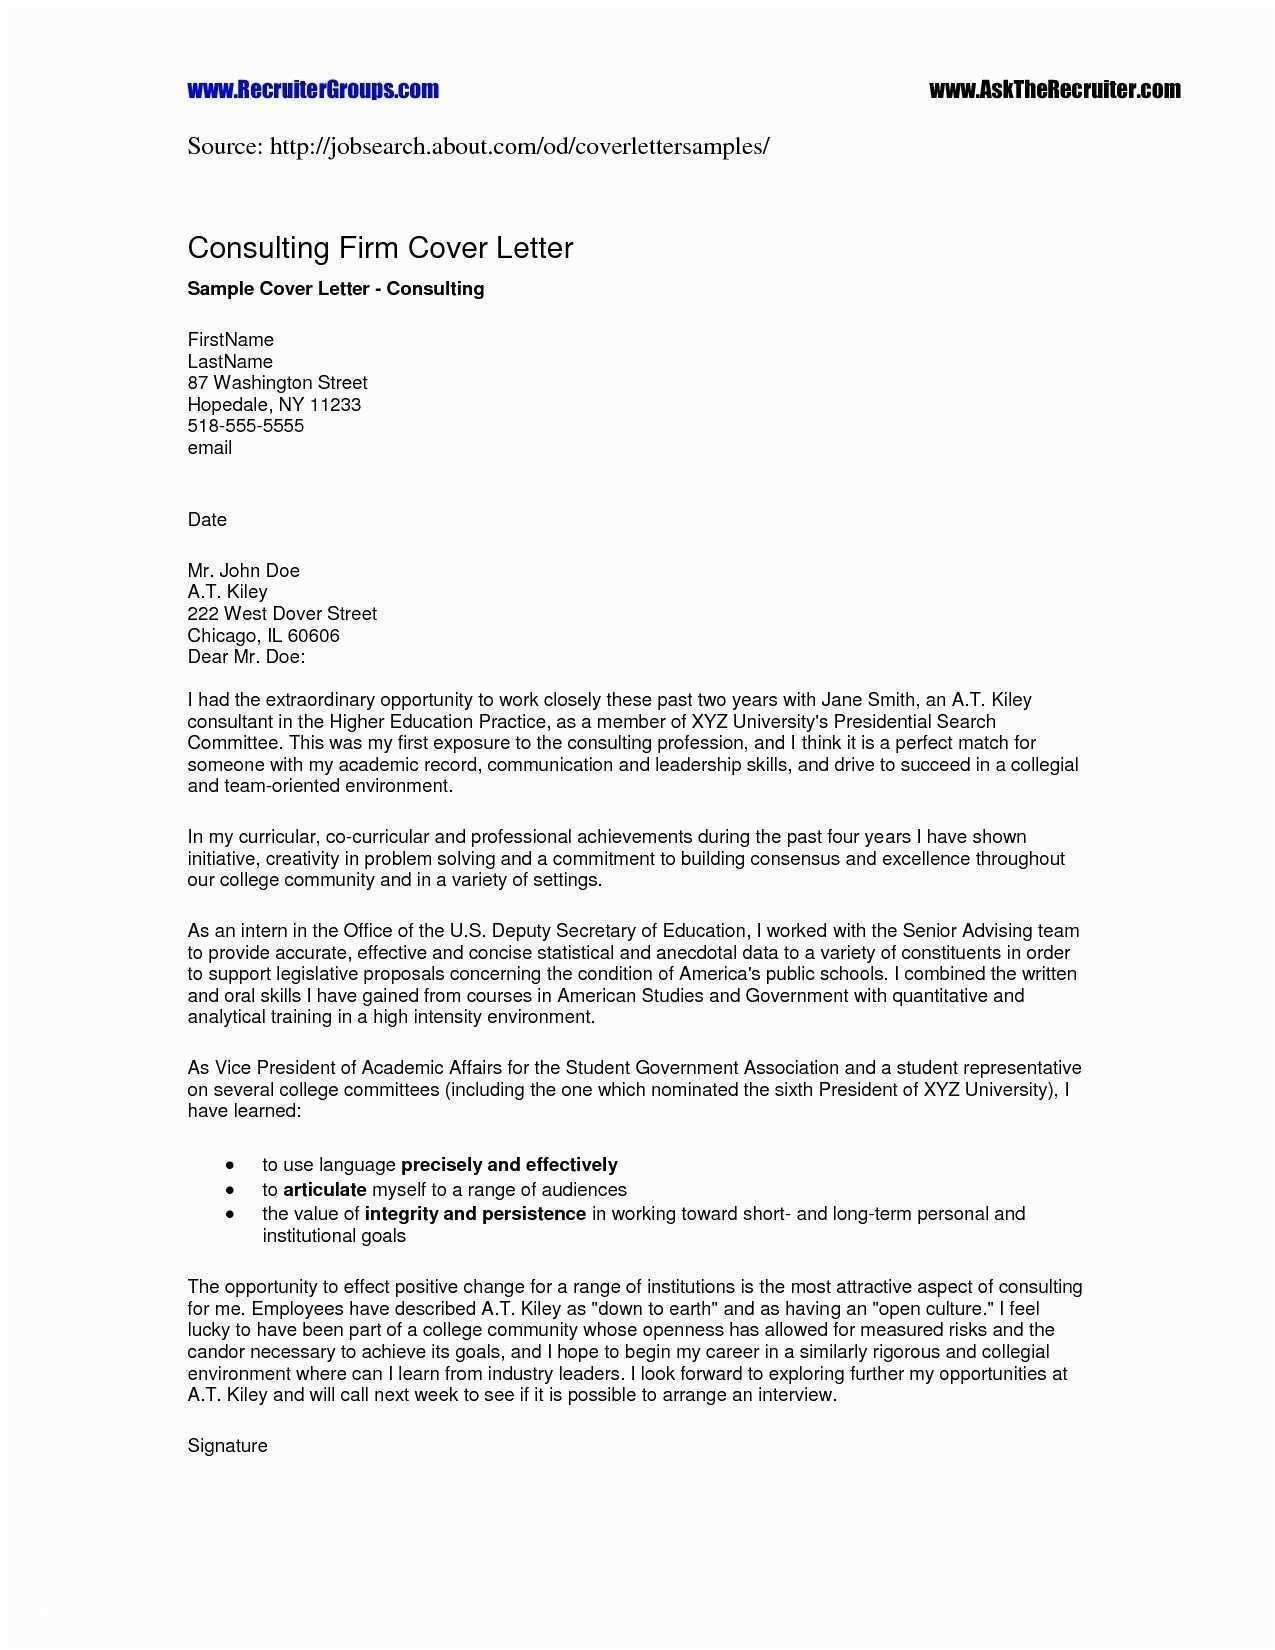 Resume Templates Microsoft Office Word 2010